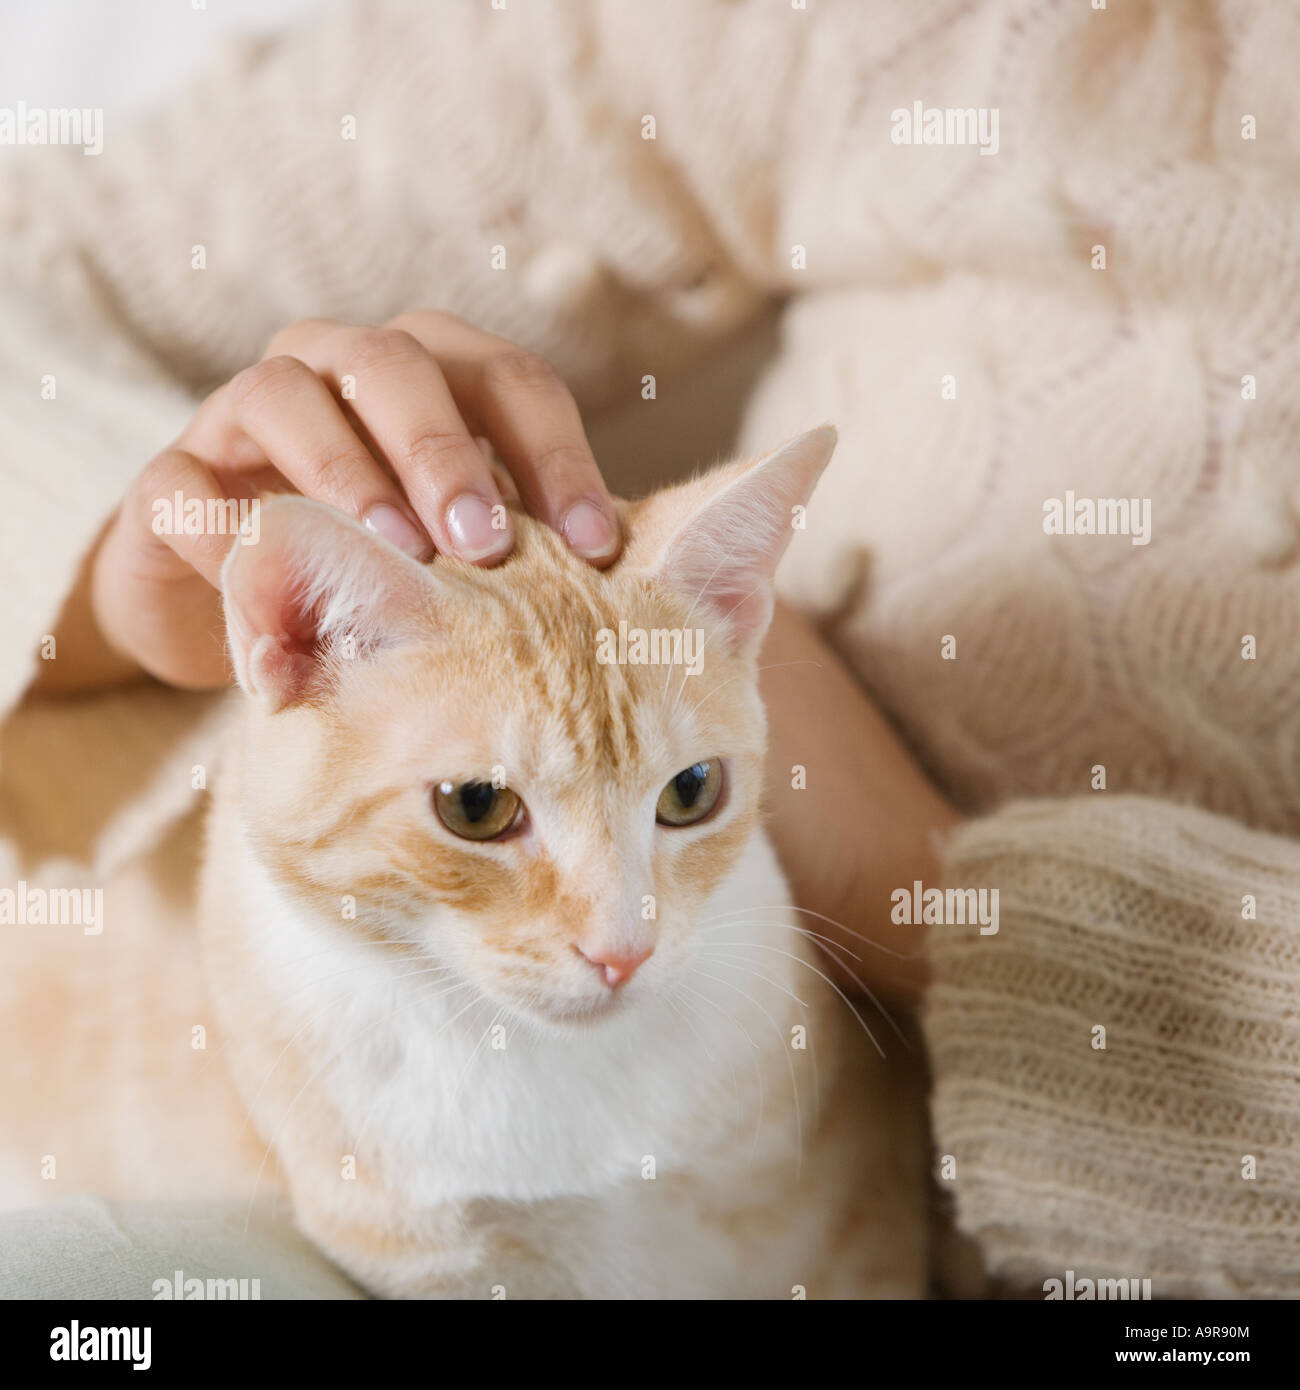 Indian woman petting cat - Stock Image